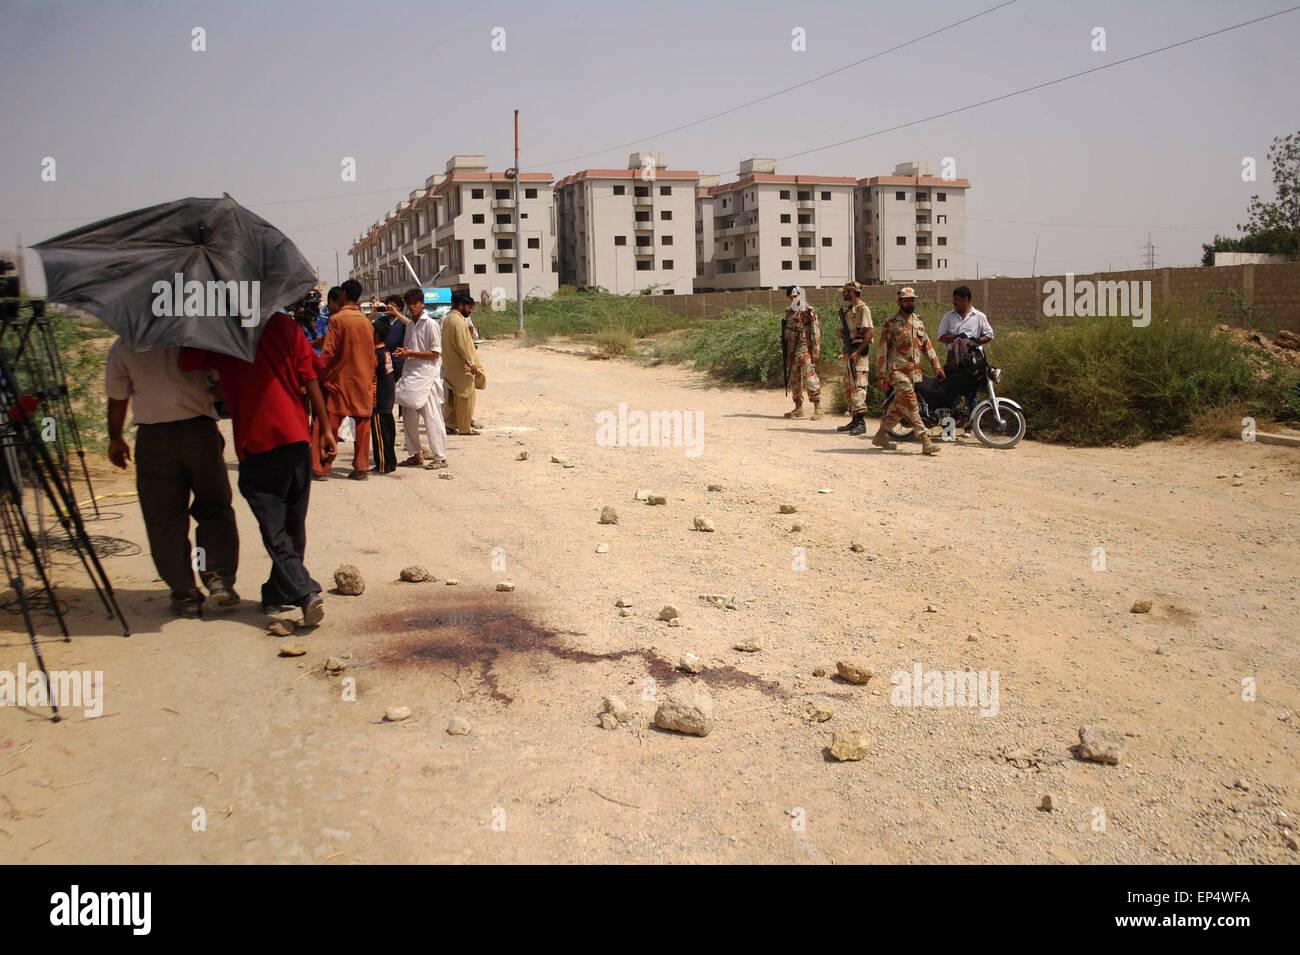 (150514) -- KARACHI, May 14, 2015 (Xinhua) -- People gather at the attack site in Karachi, Pakistan, May 13, 2015. - Stock Image